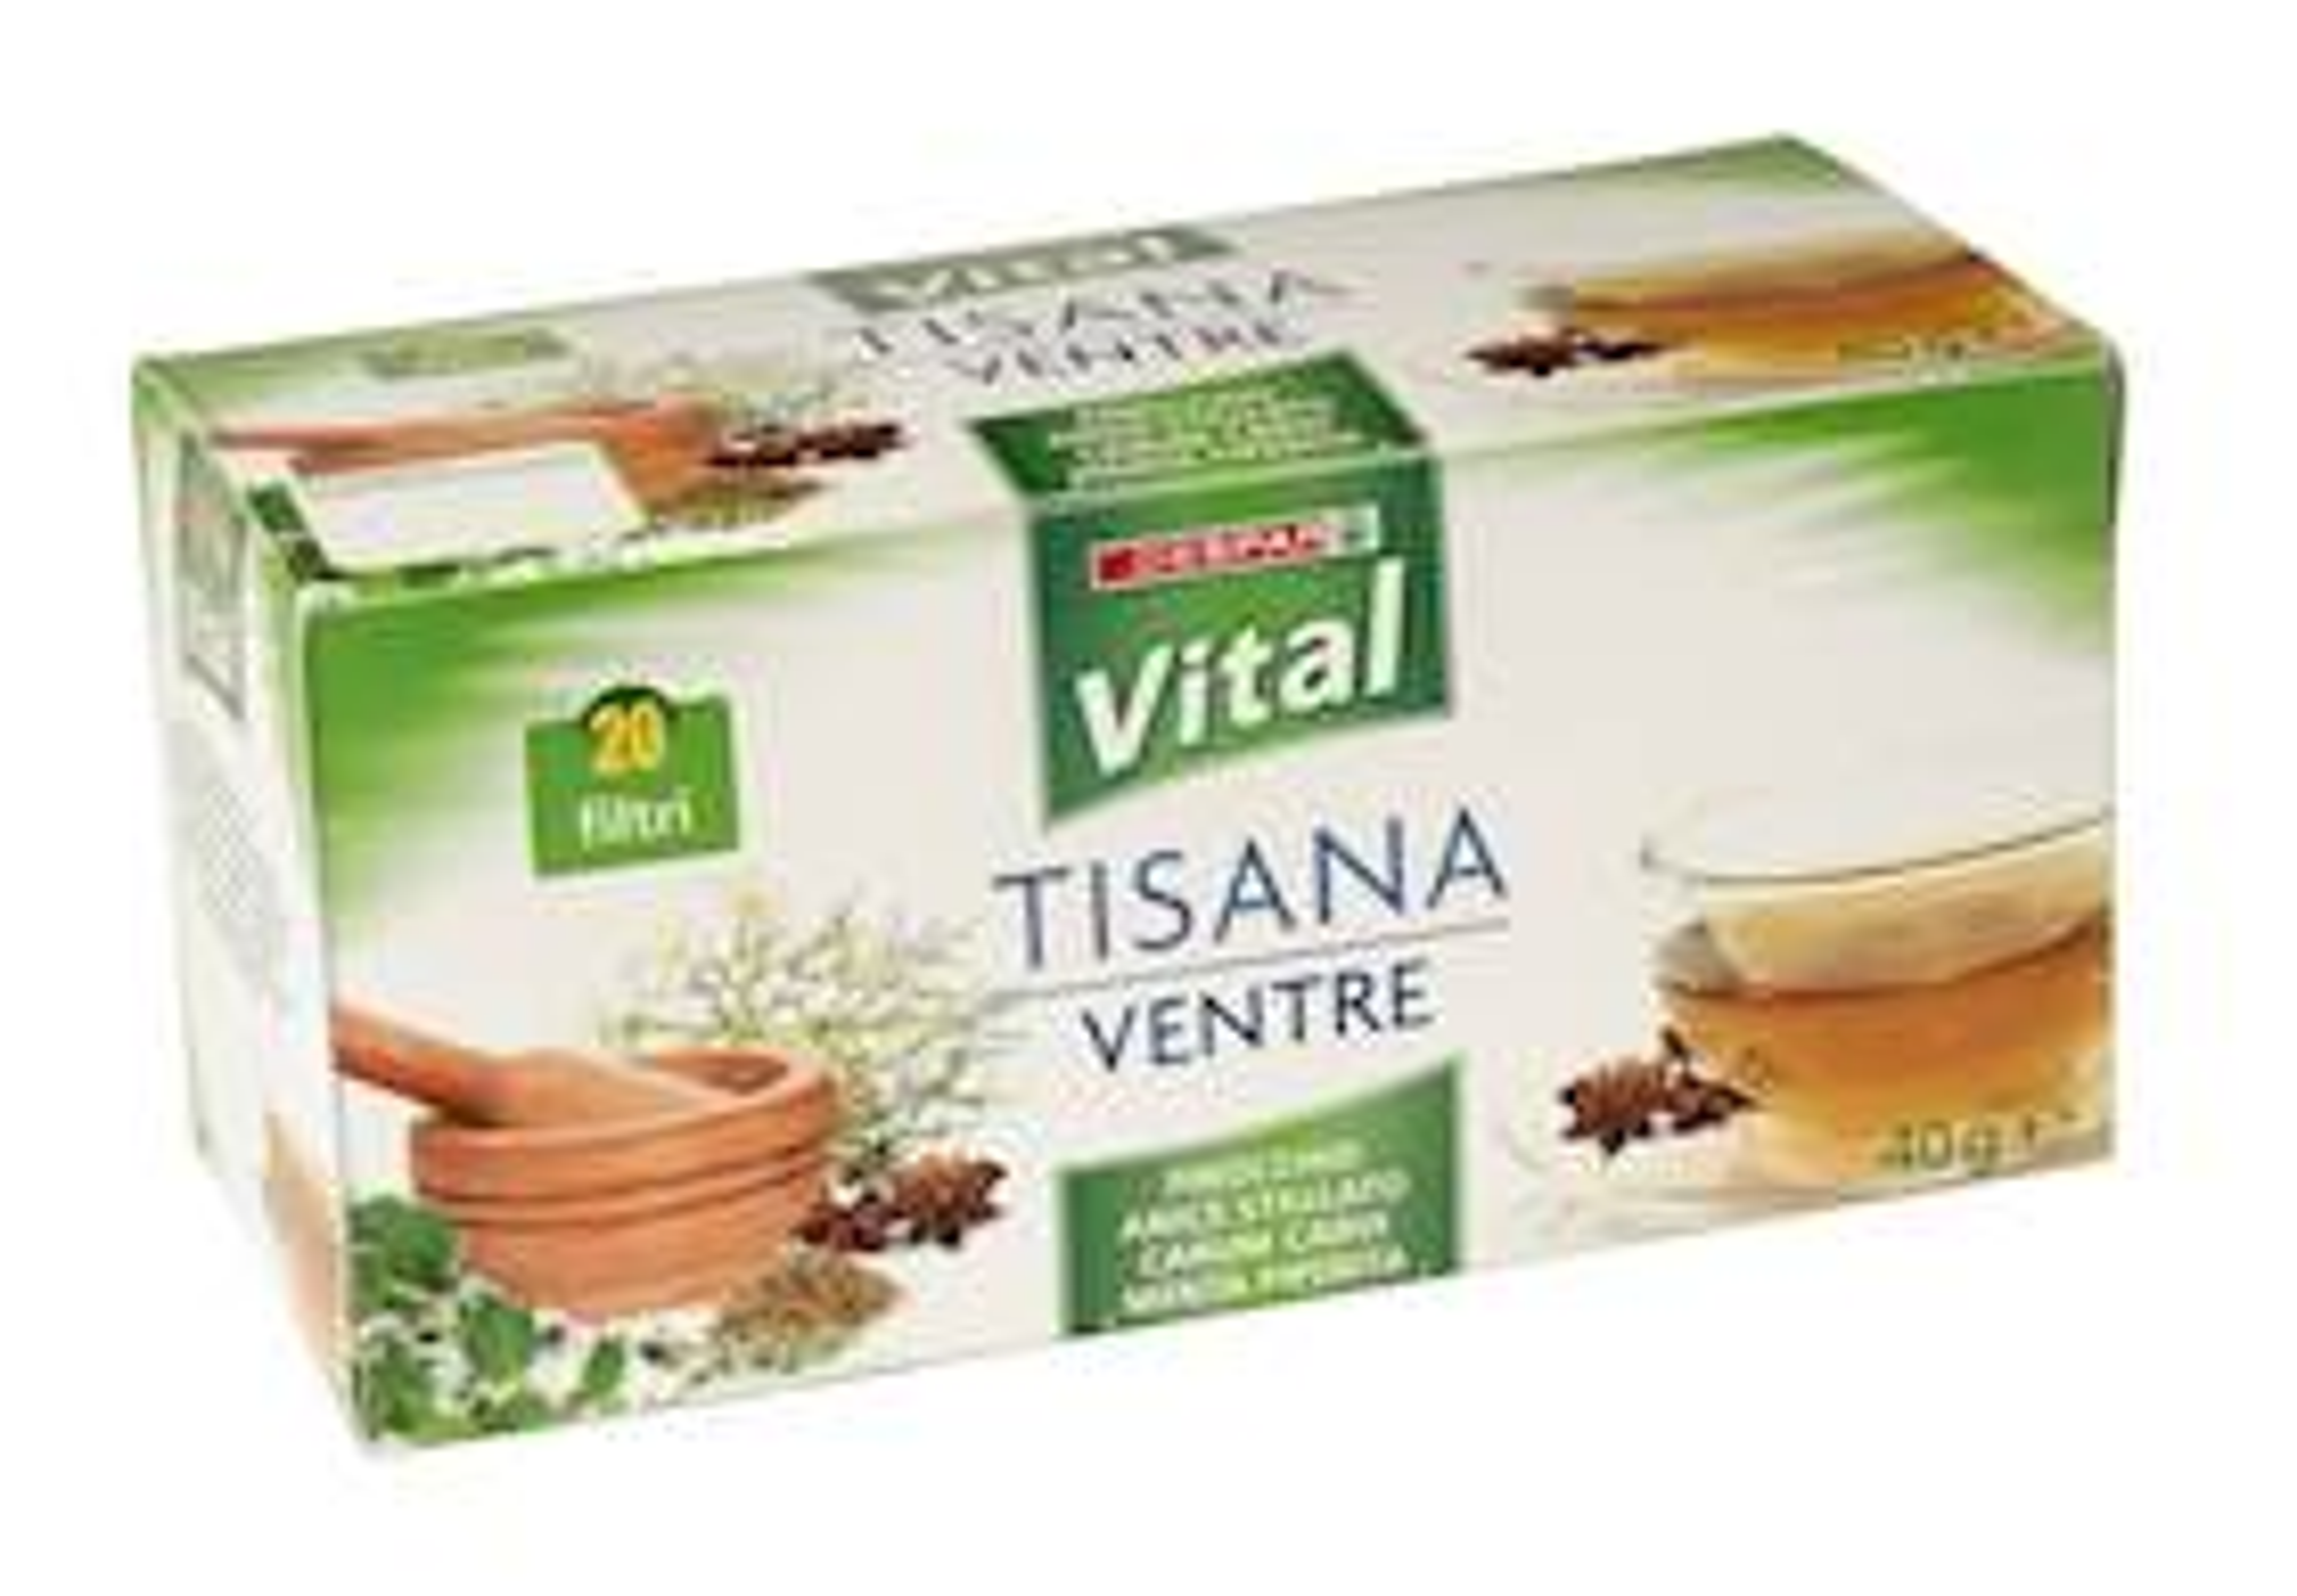 TISANA  VENTRE 20F  VITAL  40g